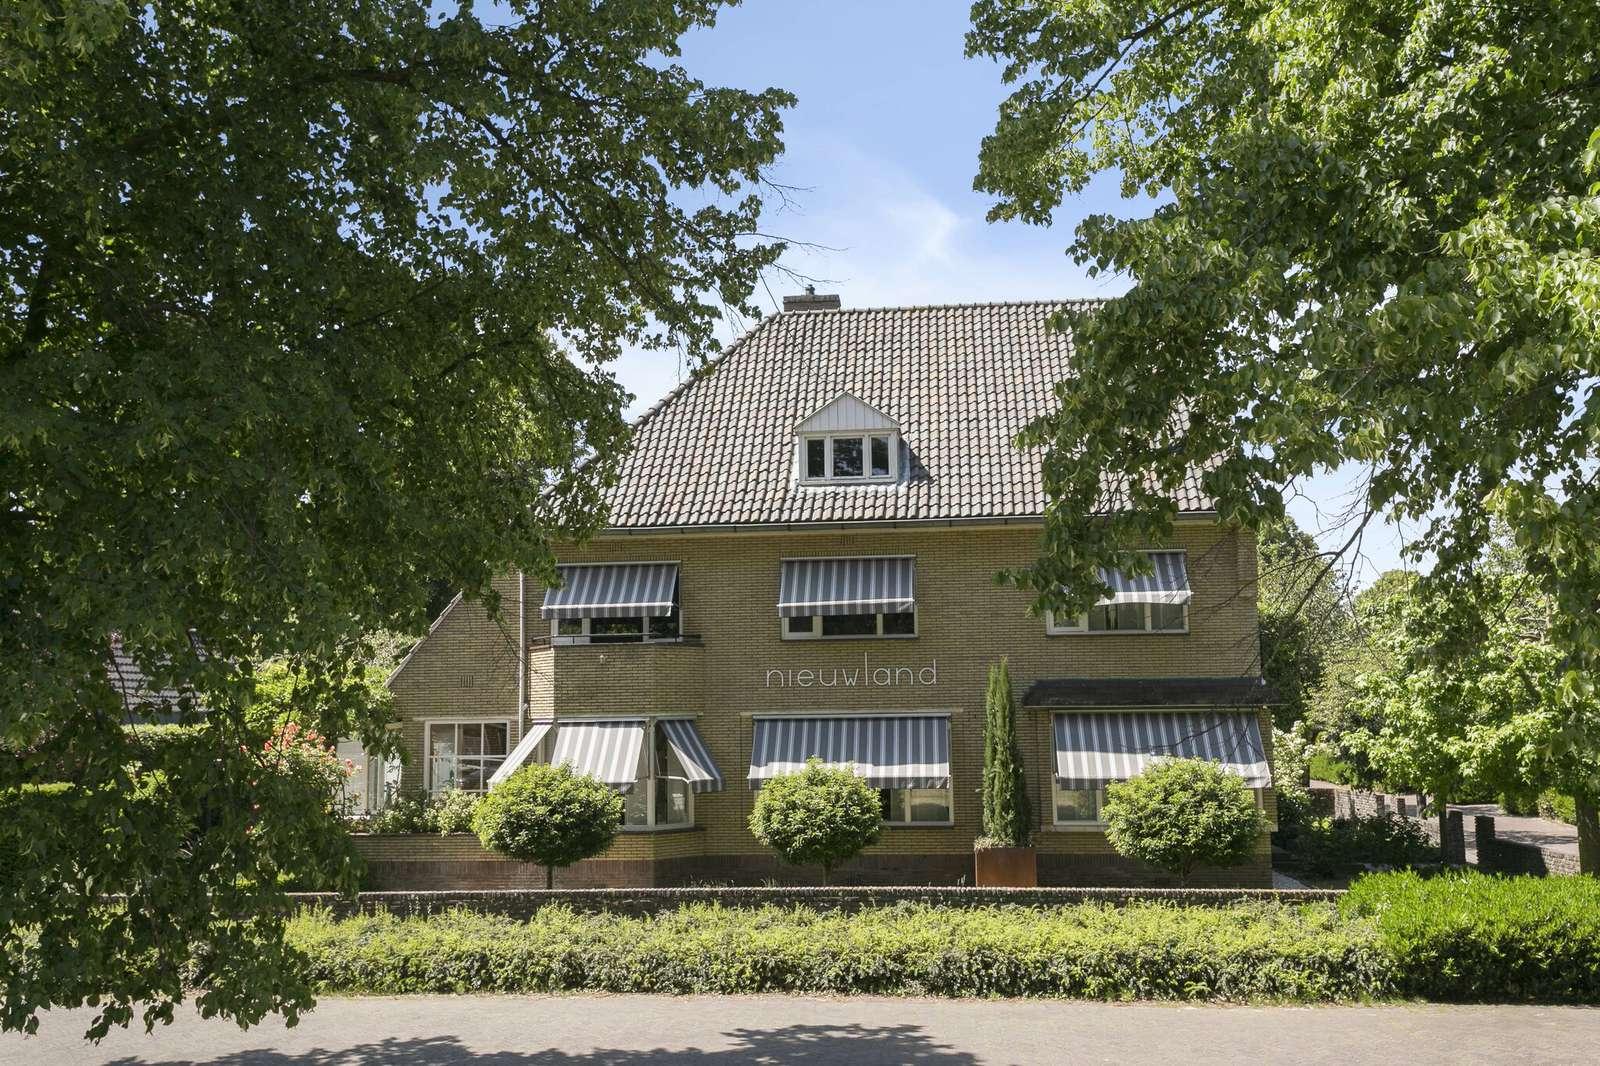 Dommelstraat 1, herenhuis Sint-Michielsgestel